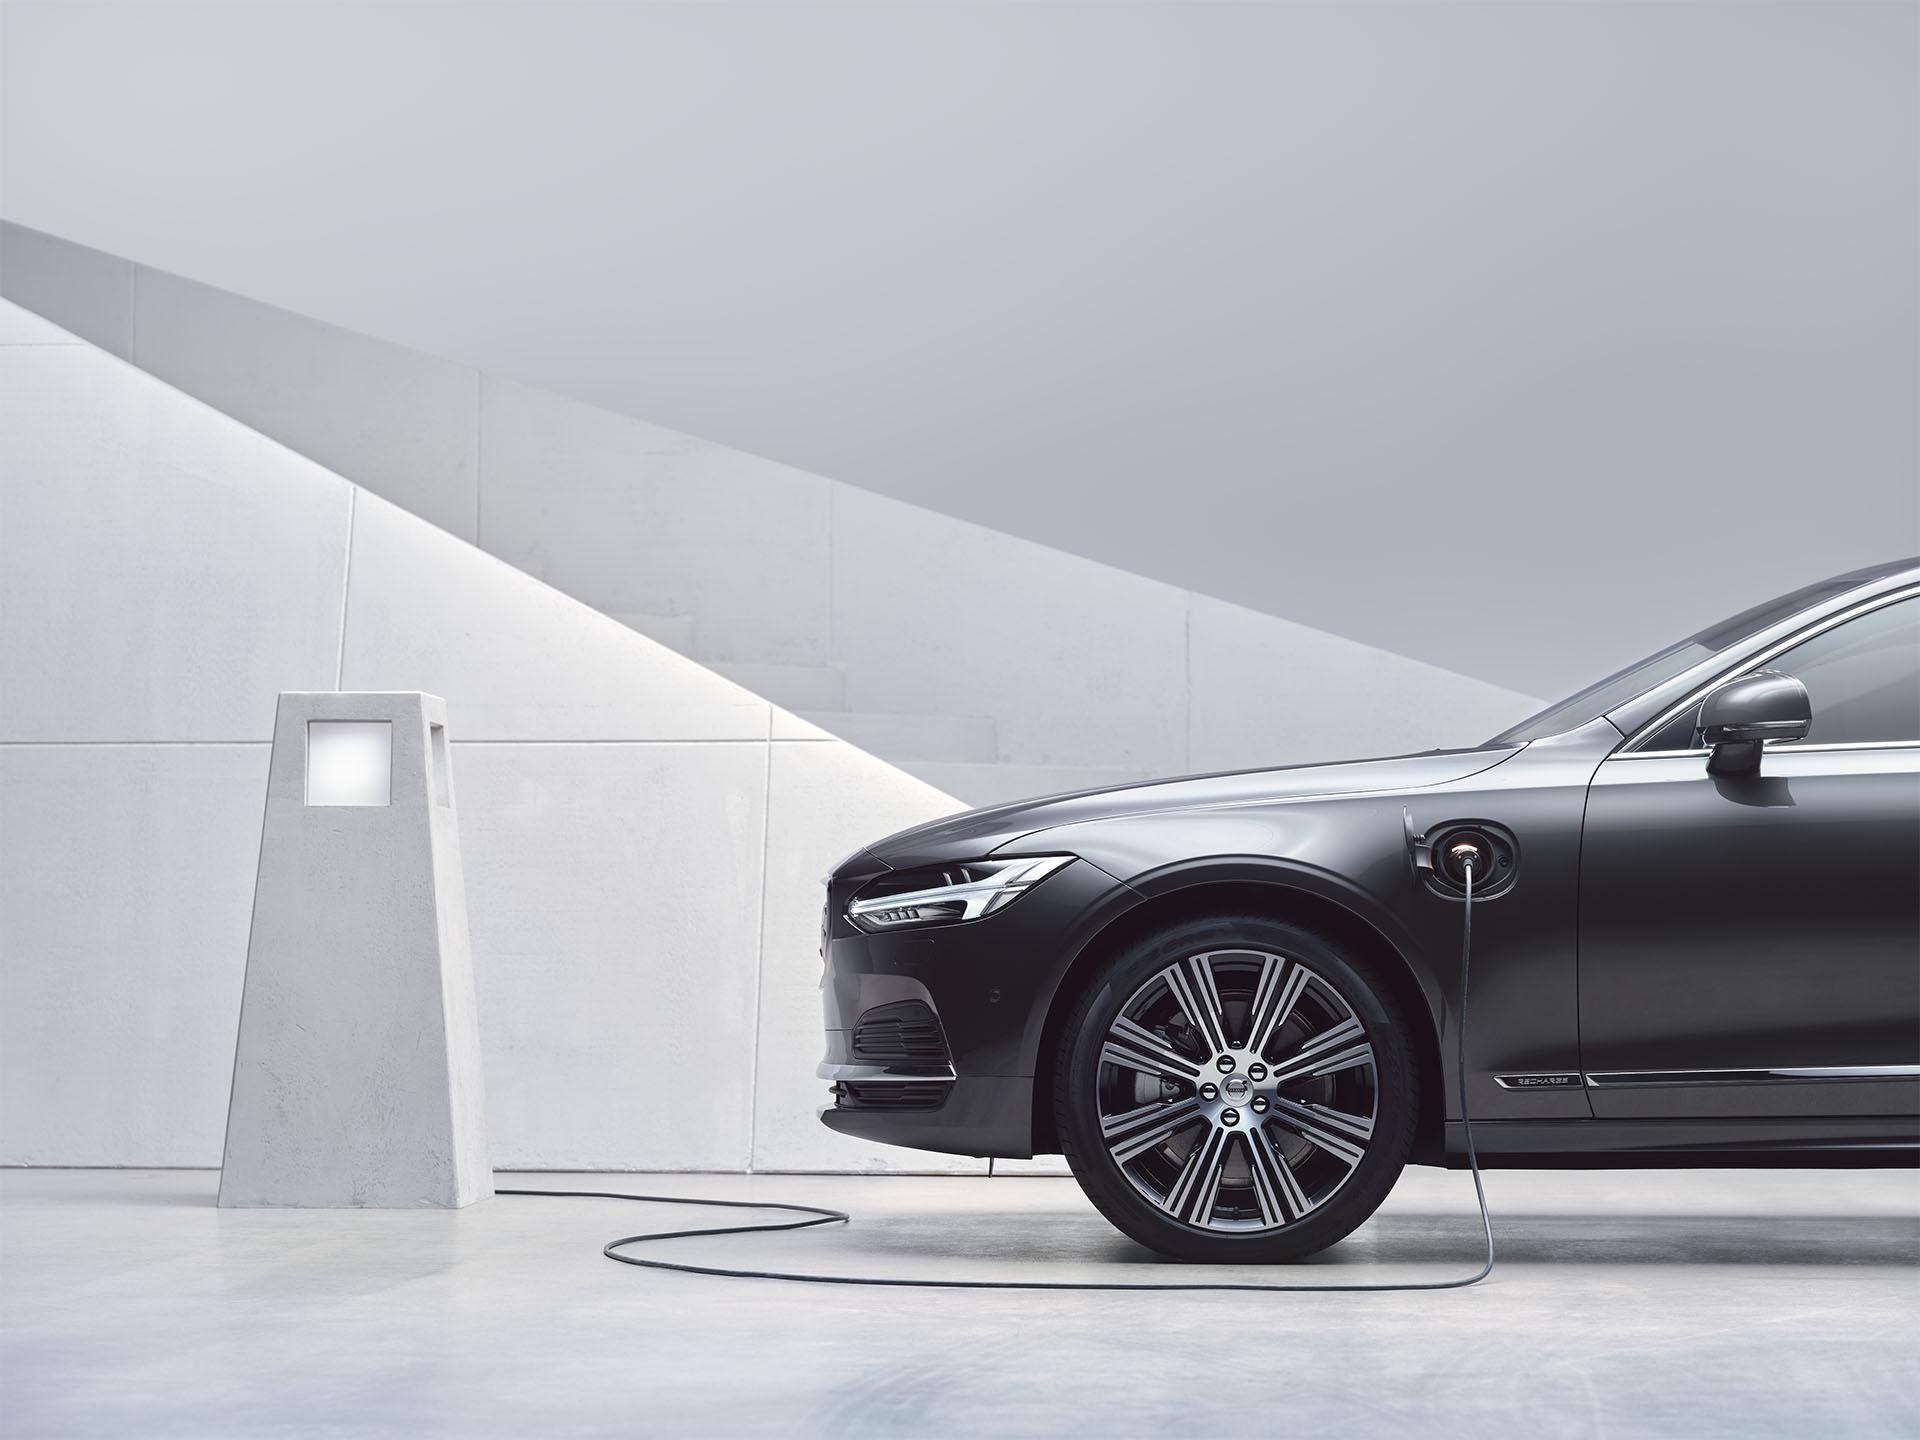 Berline Volvo S90 hybride rechargeable en charge